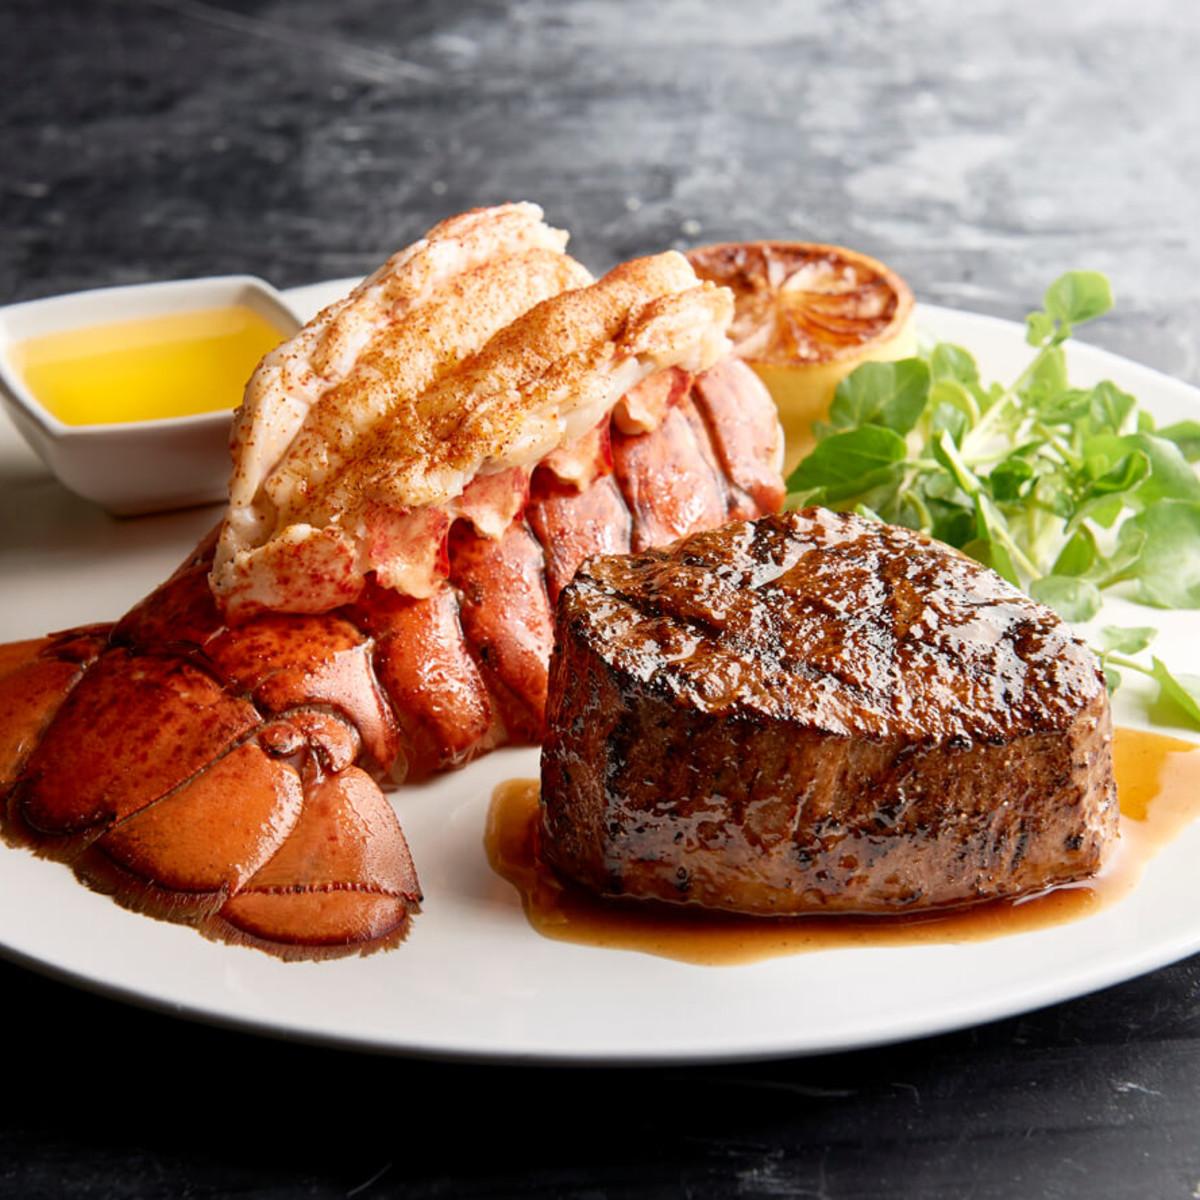 Houston_Mortons Steakhouse_filet mignon and lobster tail_Dec 2016